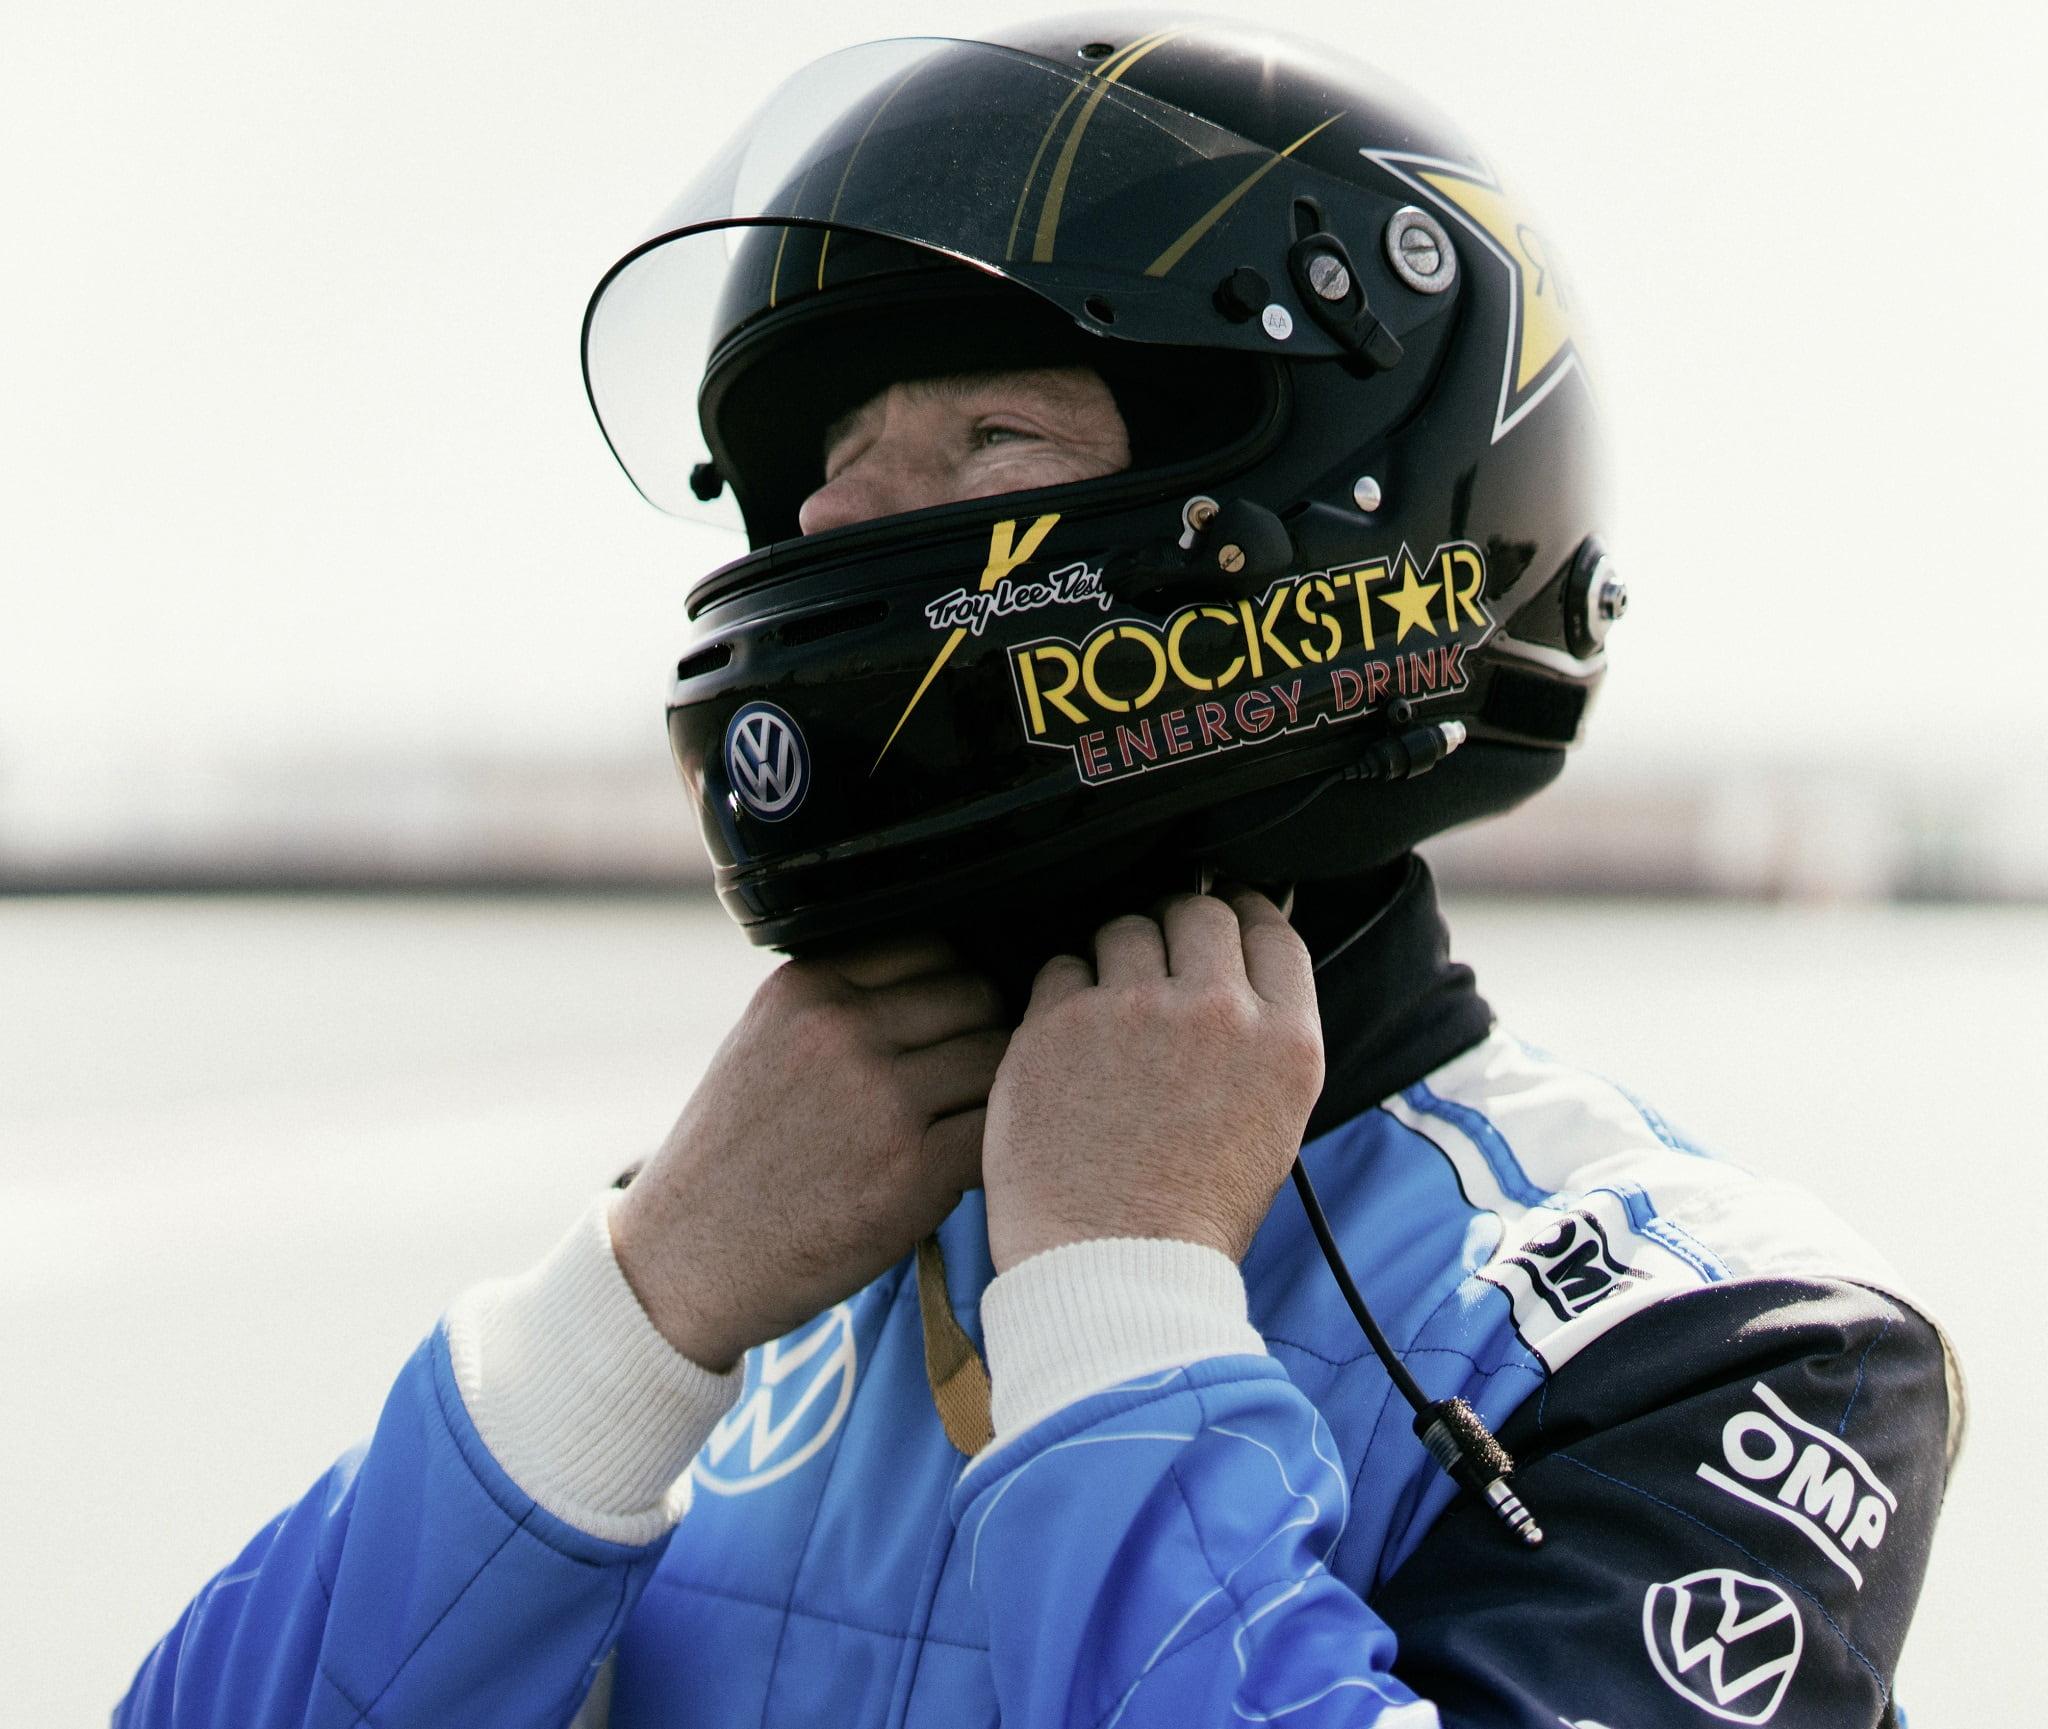 Volkswagen R - Ο Tanner Foust φοράει το κράνος